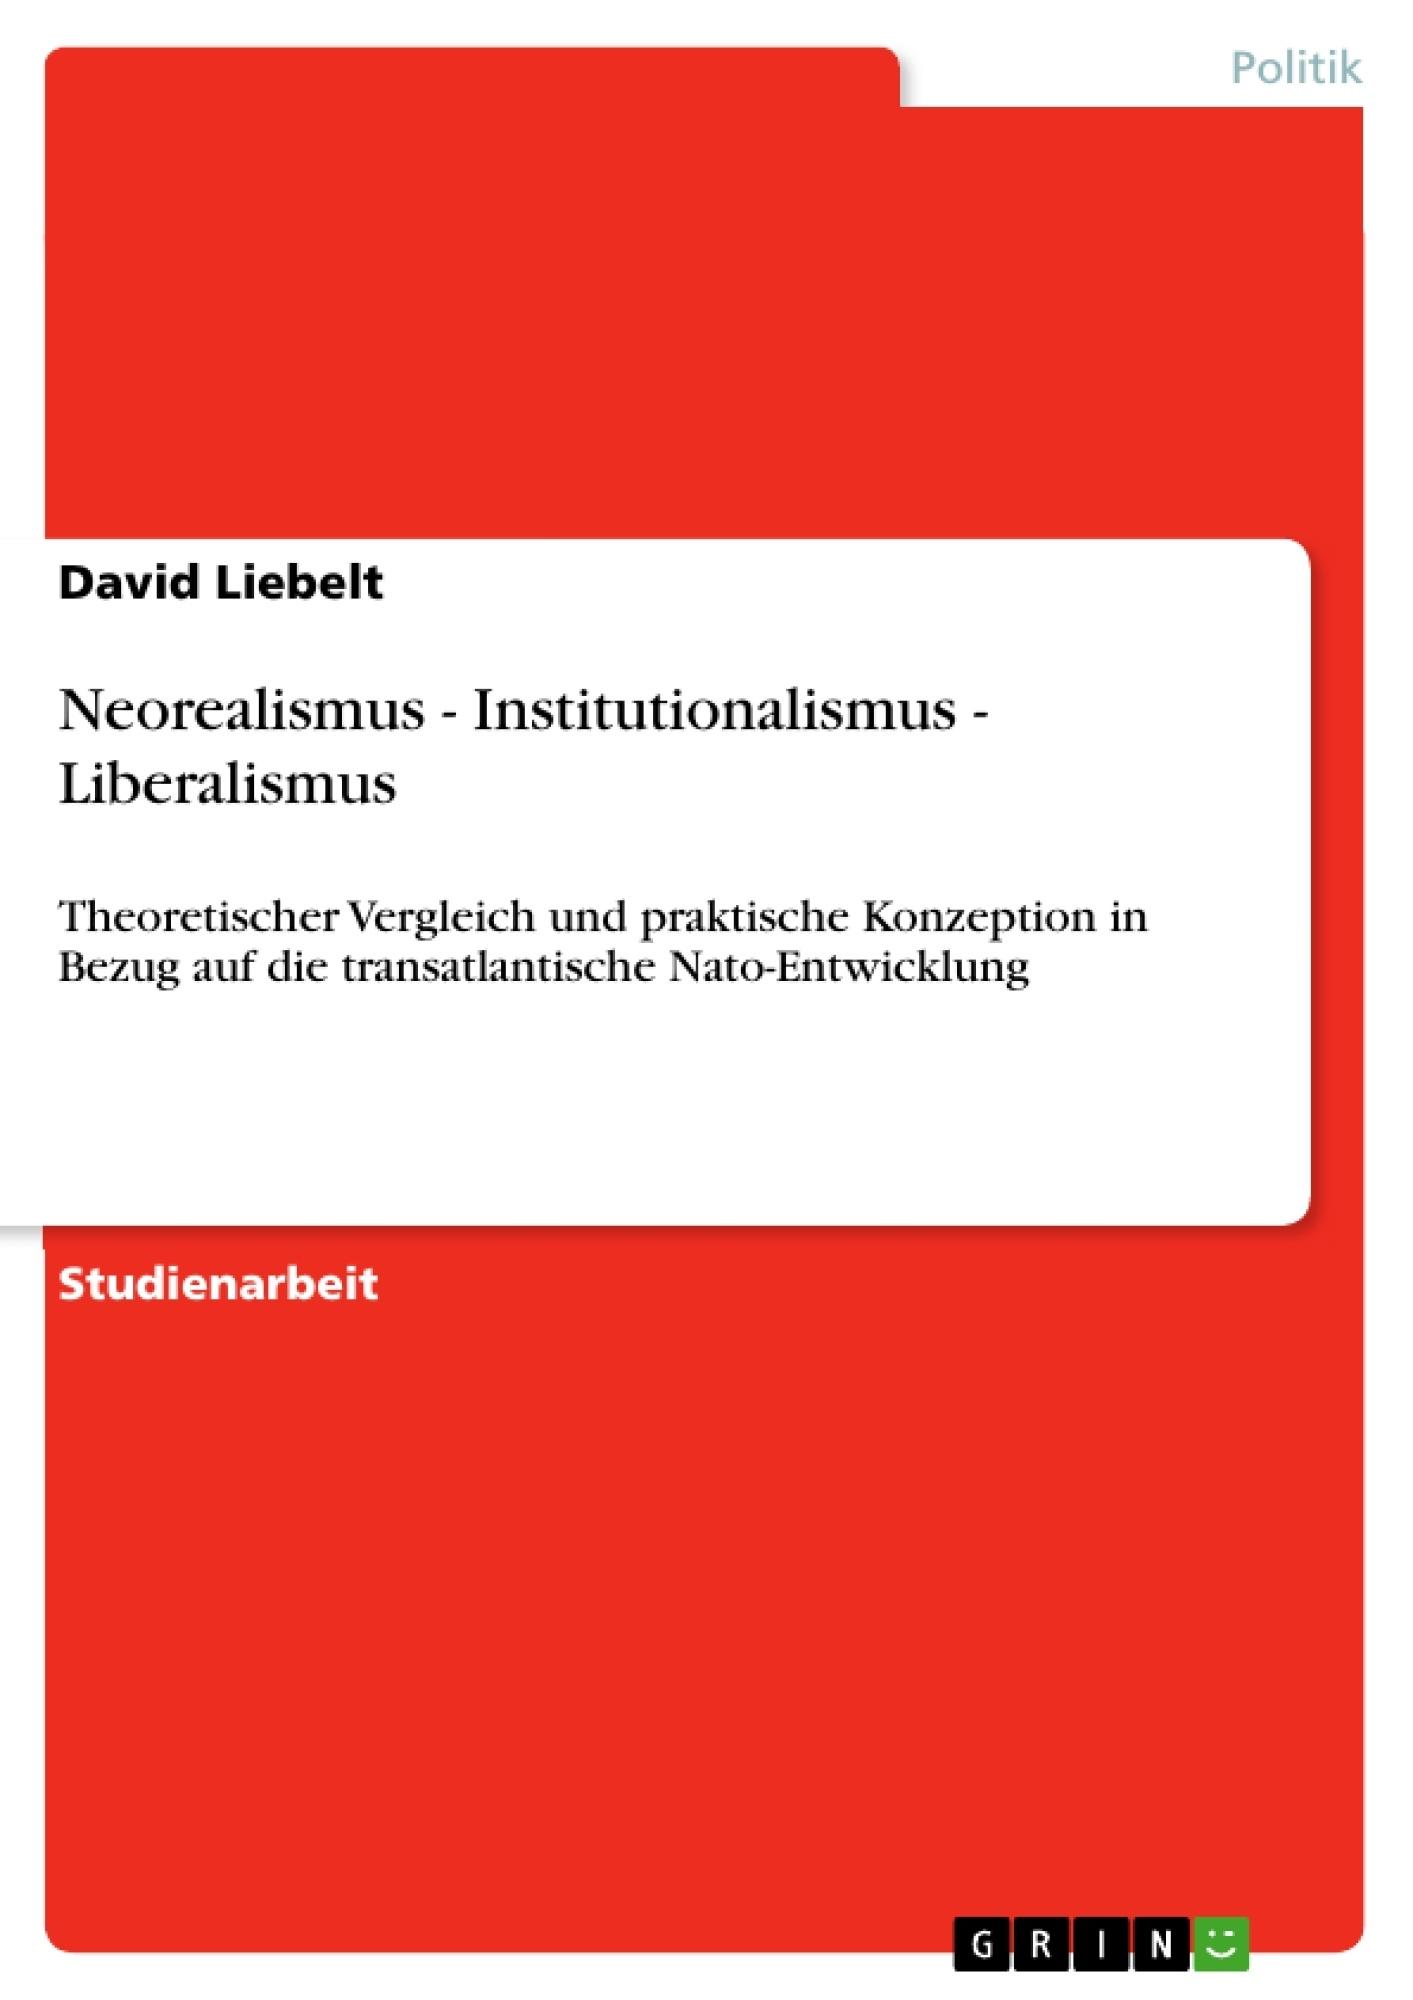 Titel: Neorealismus - Institutionalismus - Liberalismus